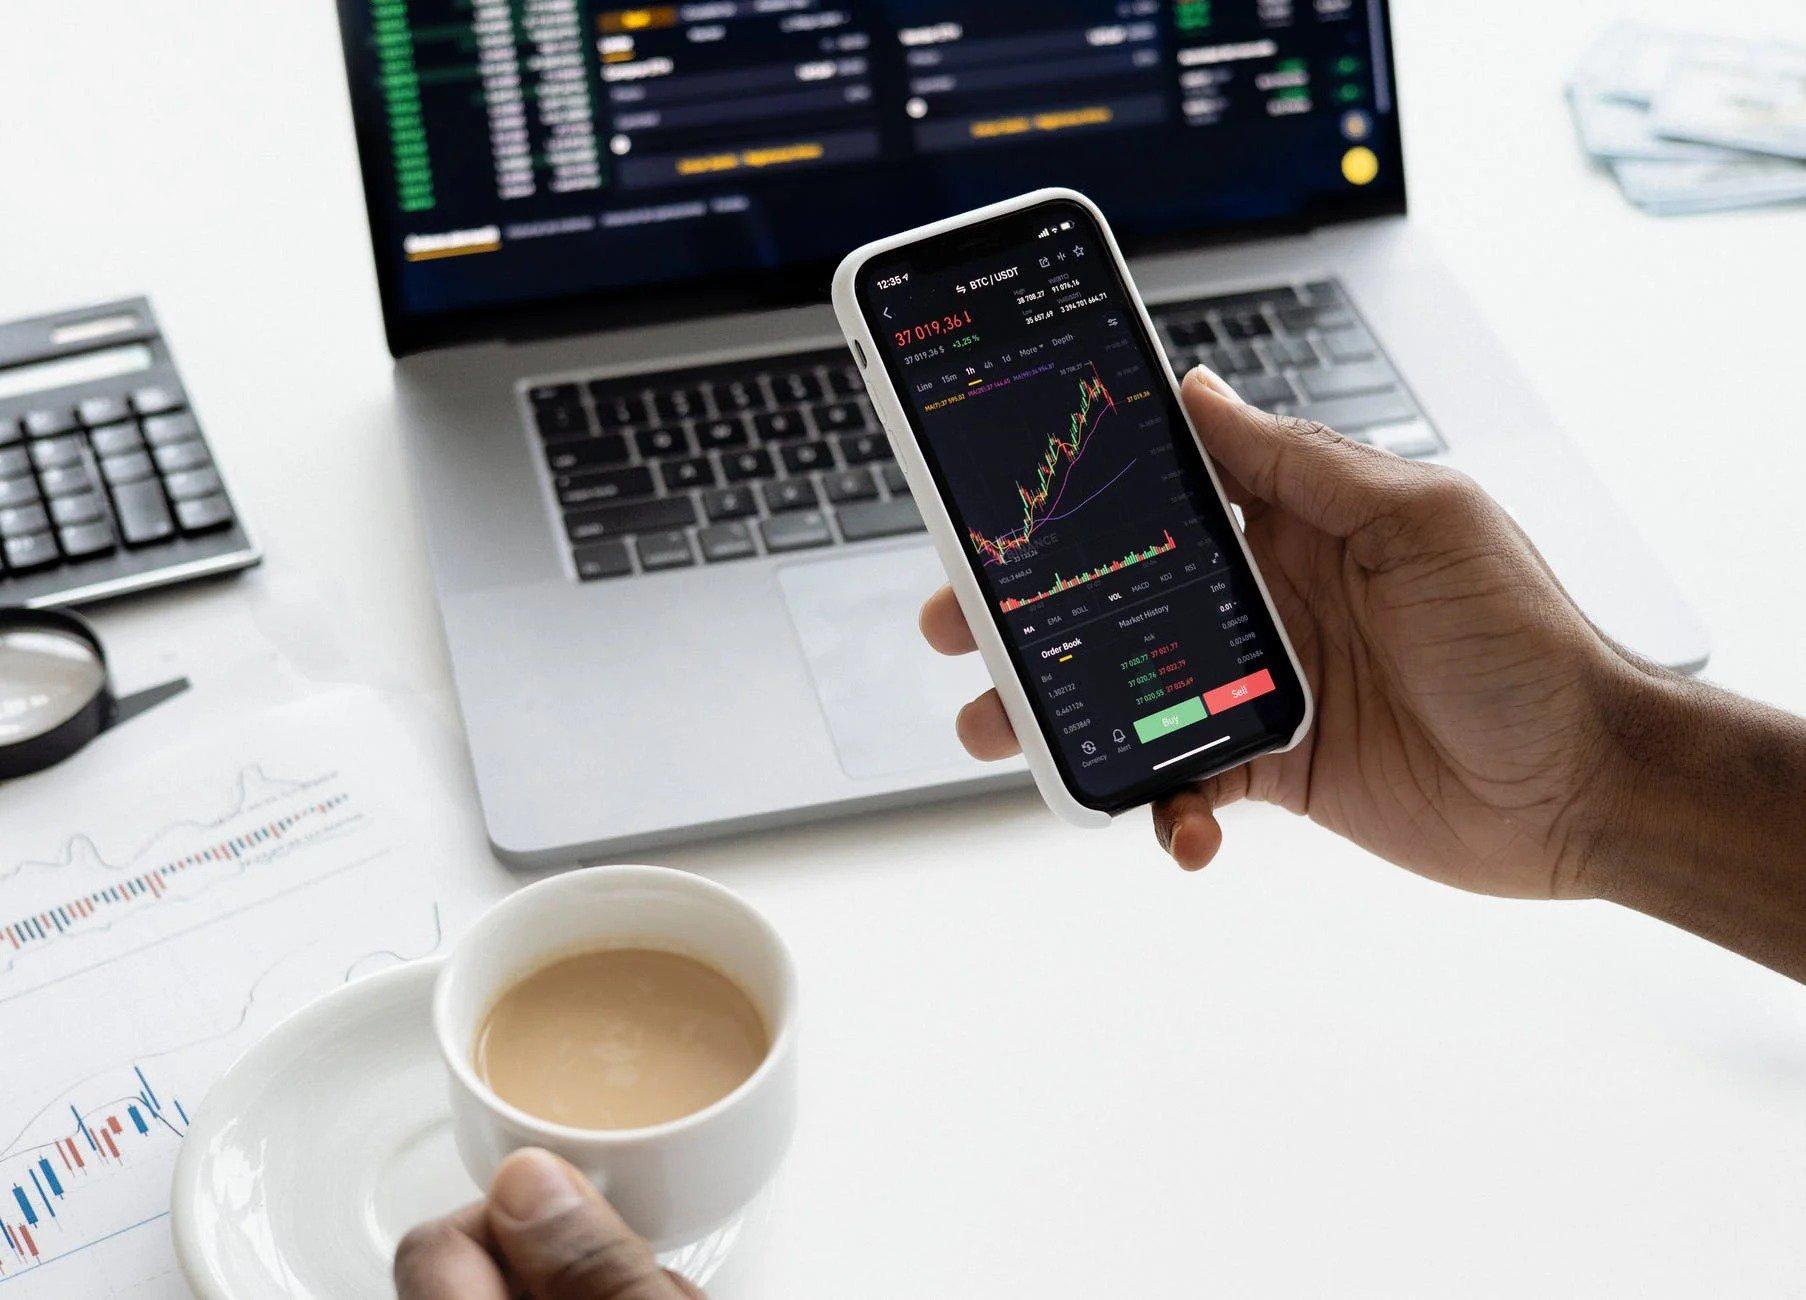 digital marketing consultant - Analyze